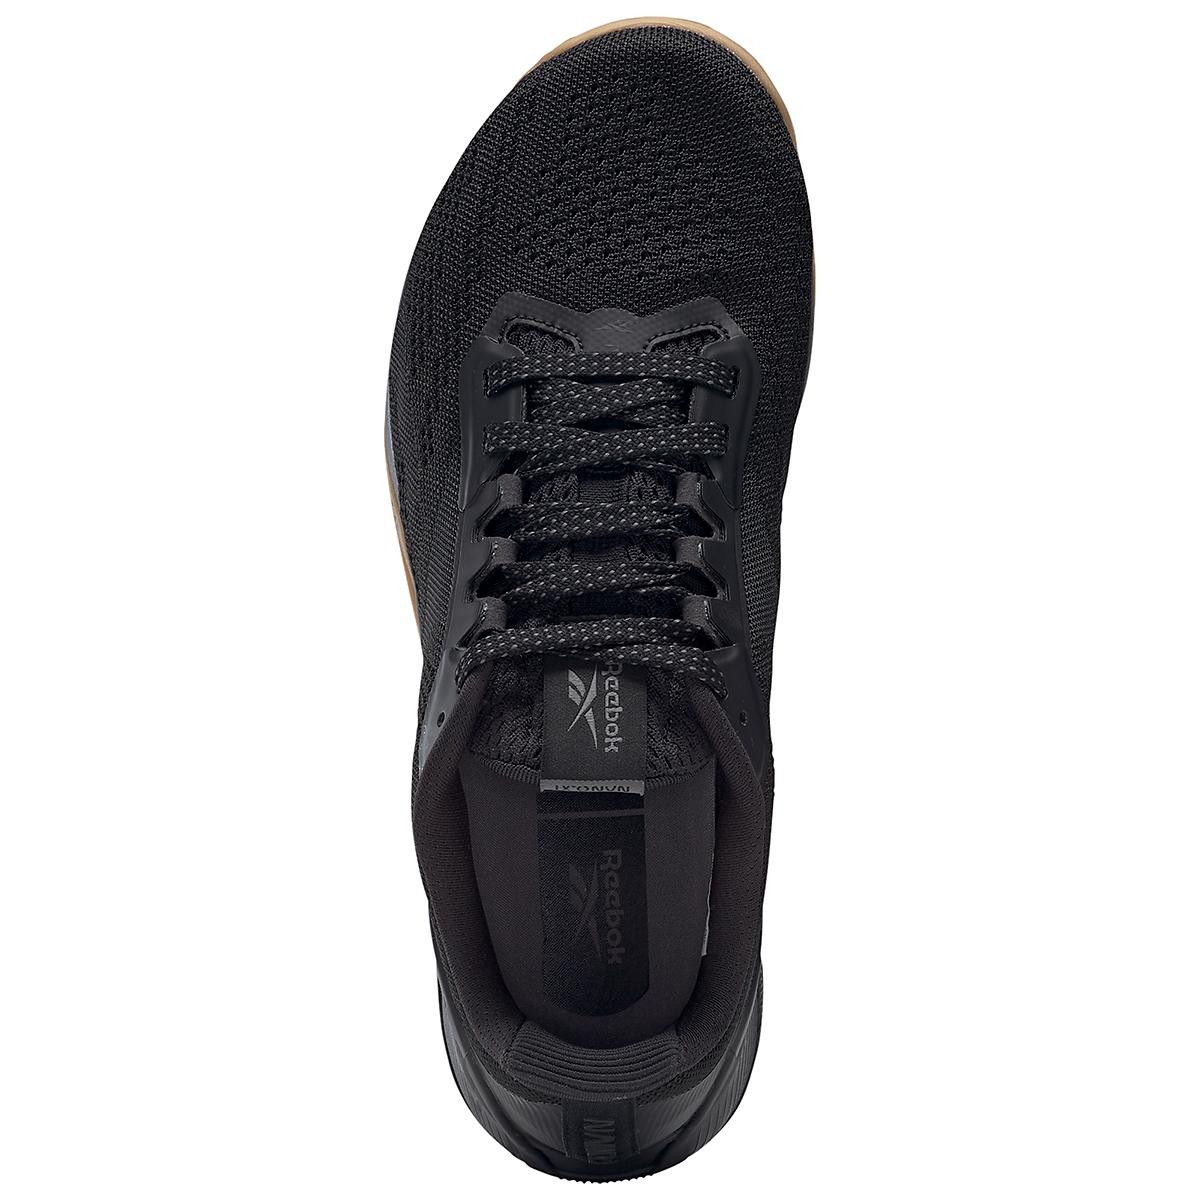 Men's Reebok Nano X1 Training Shoe - Color: Black/Night Black/Rubber Gum - Size: 6.5 - Width: Regular, Black/Night Black/Rubber Gum, large, image 7